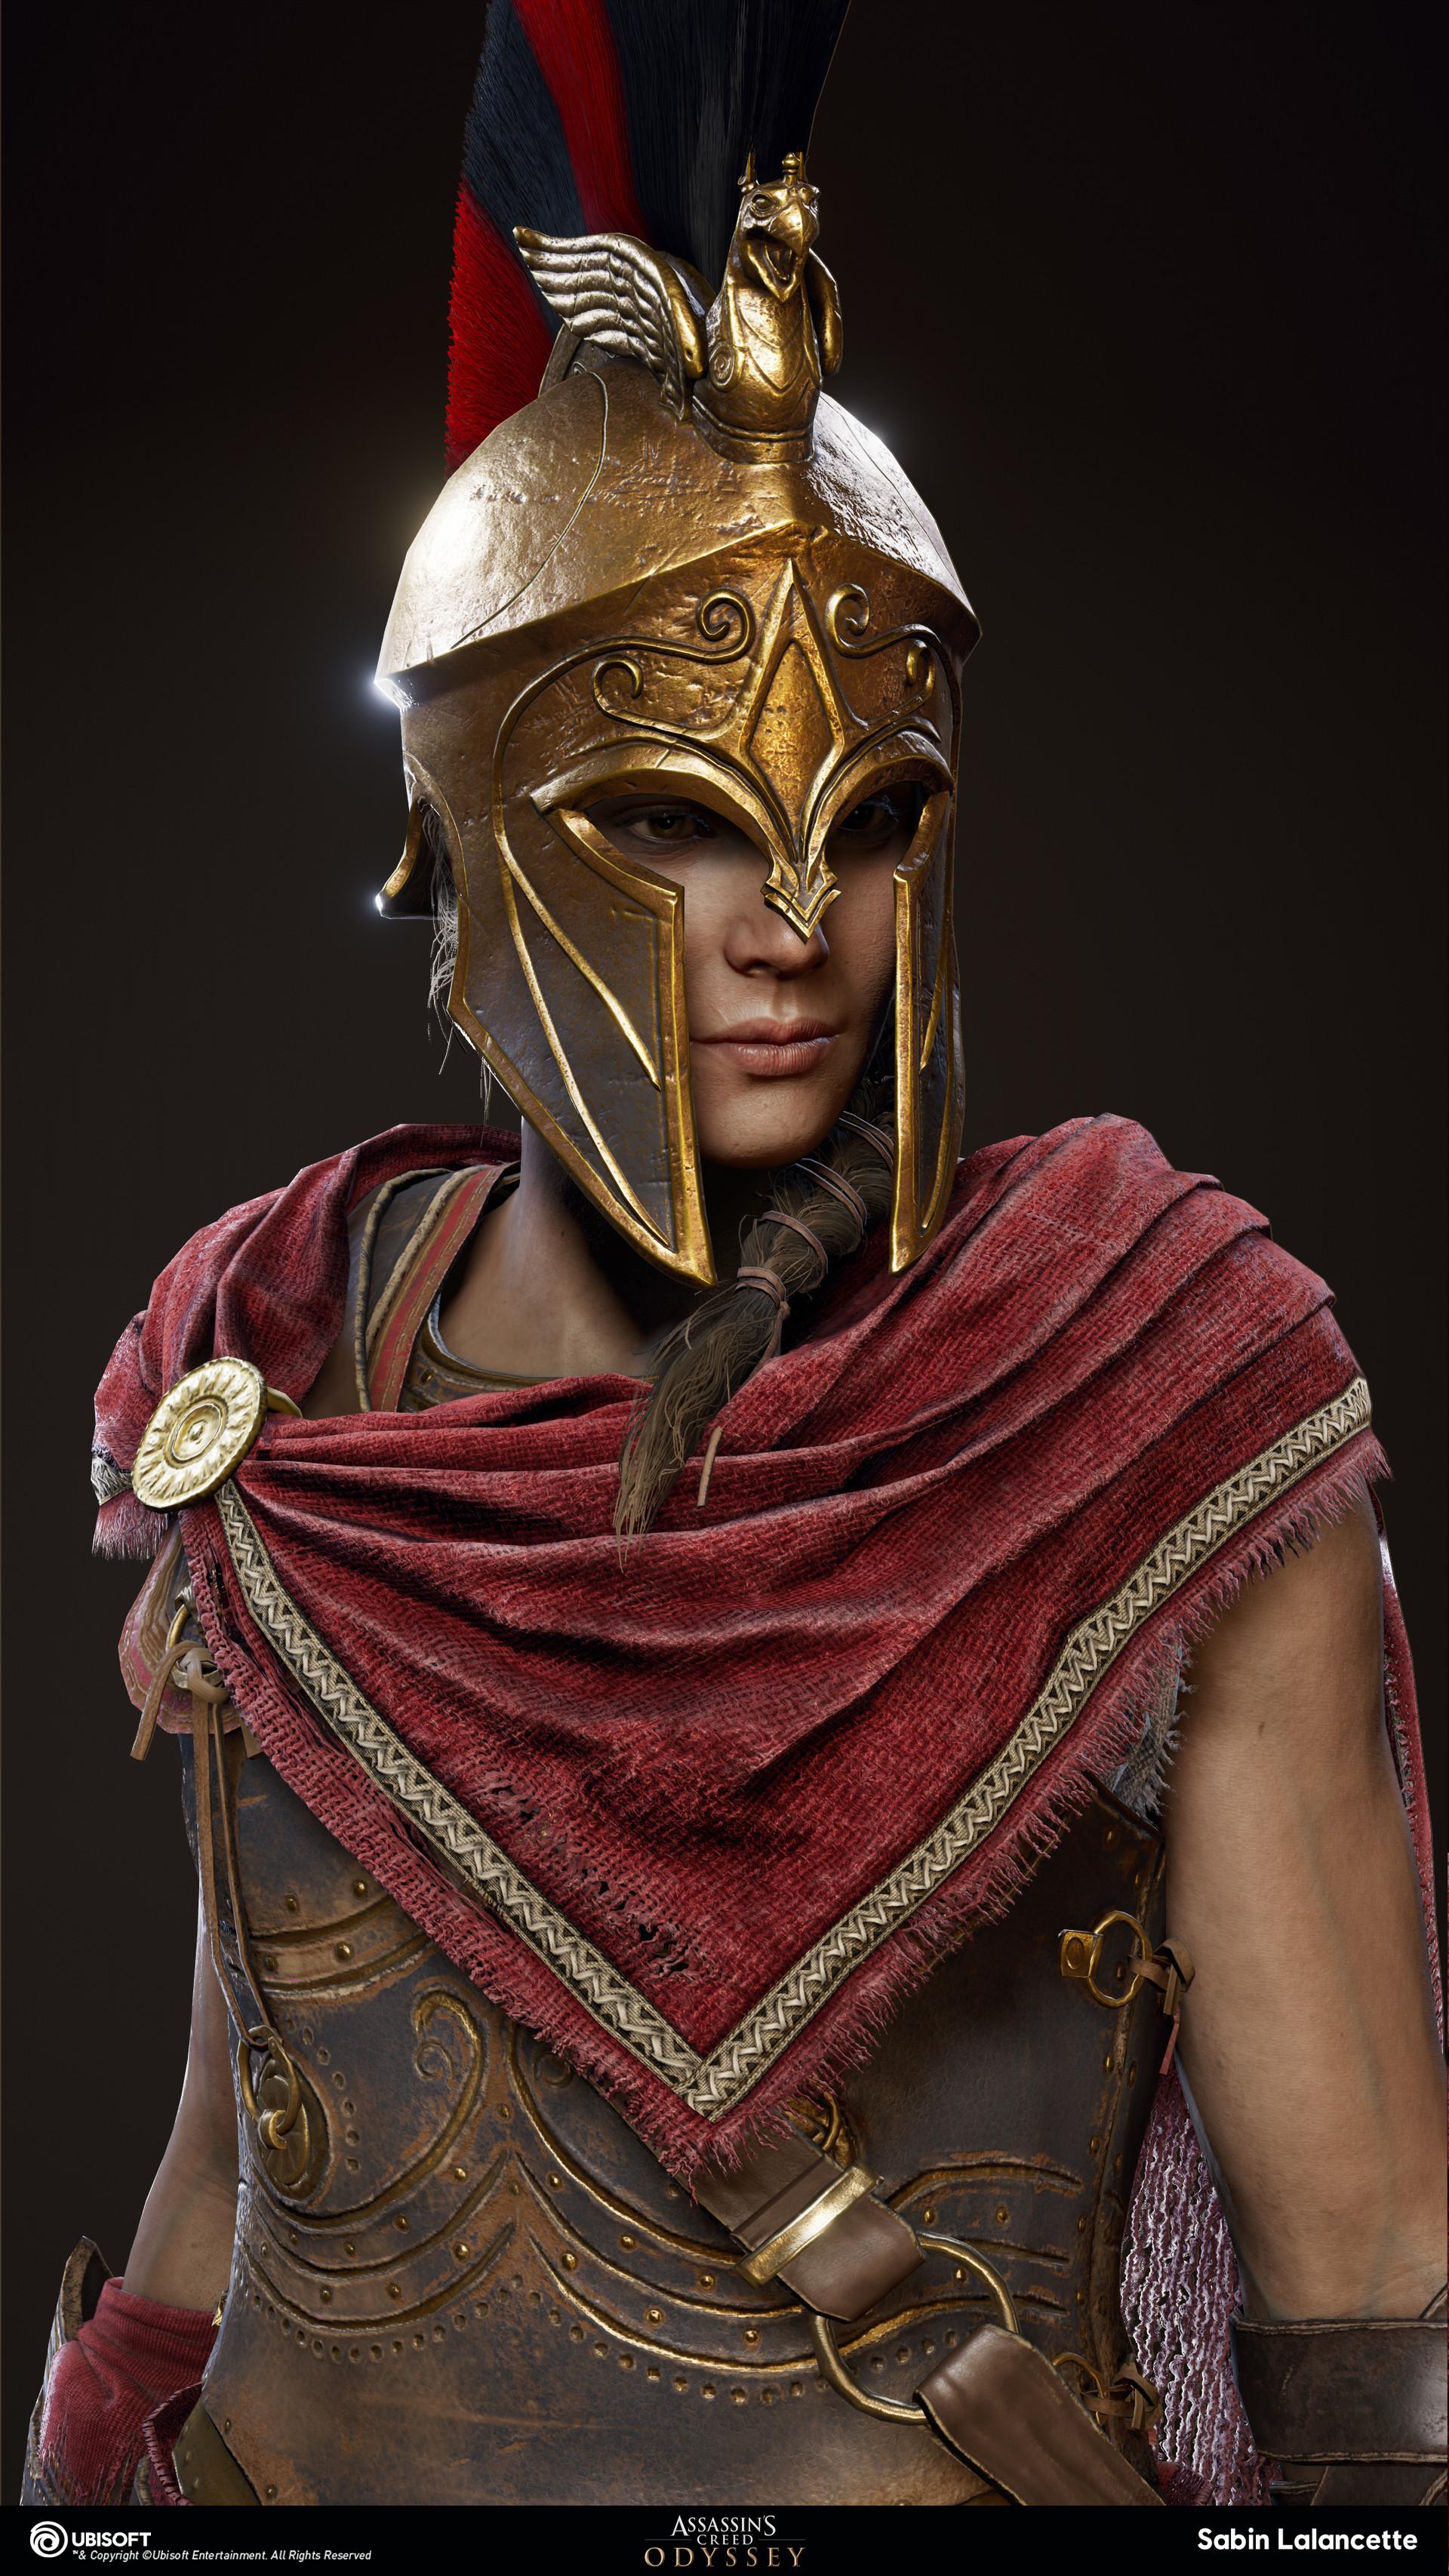 sabin-lalancette-artblast-fullsize-outfit-mercenary-portrait-kassandra-slalancette